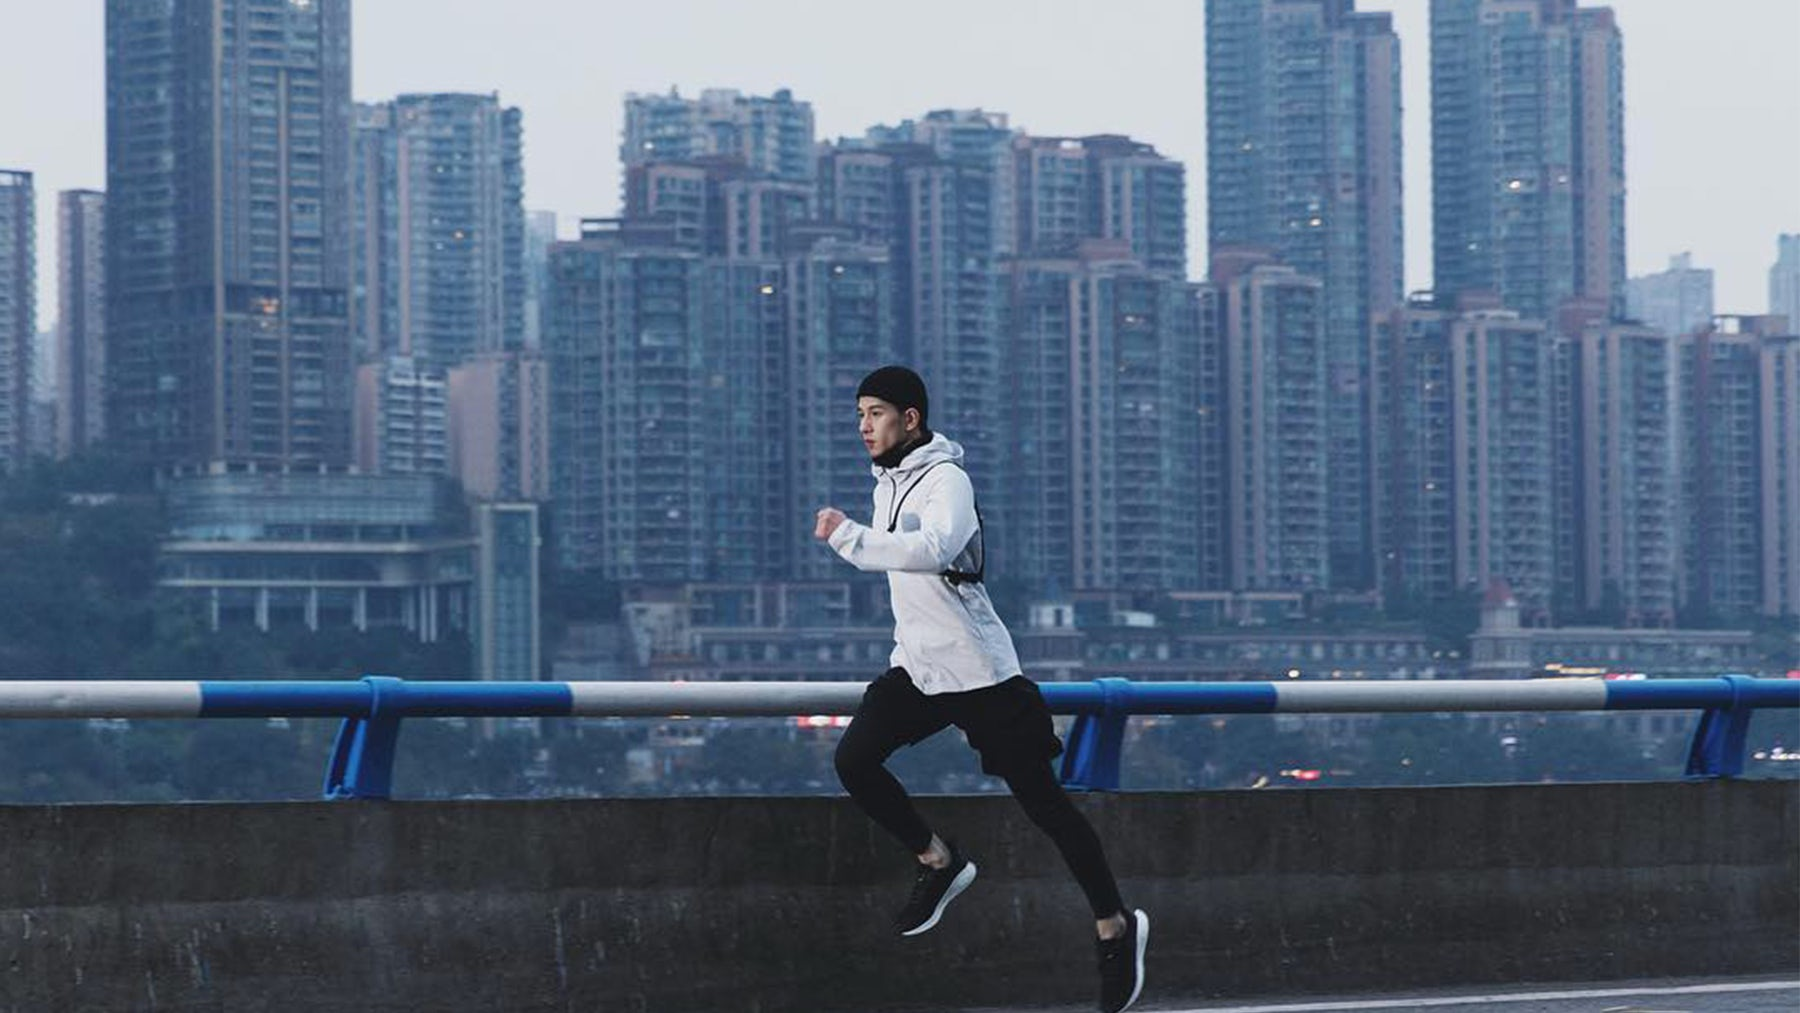 ANTA Sports advertisement | Source: @antasportsofficial Instagram